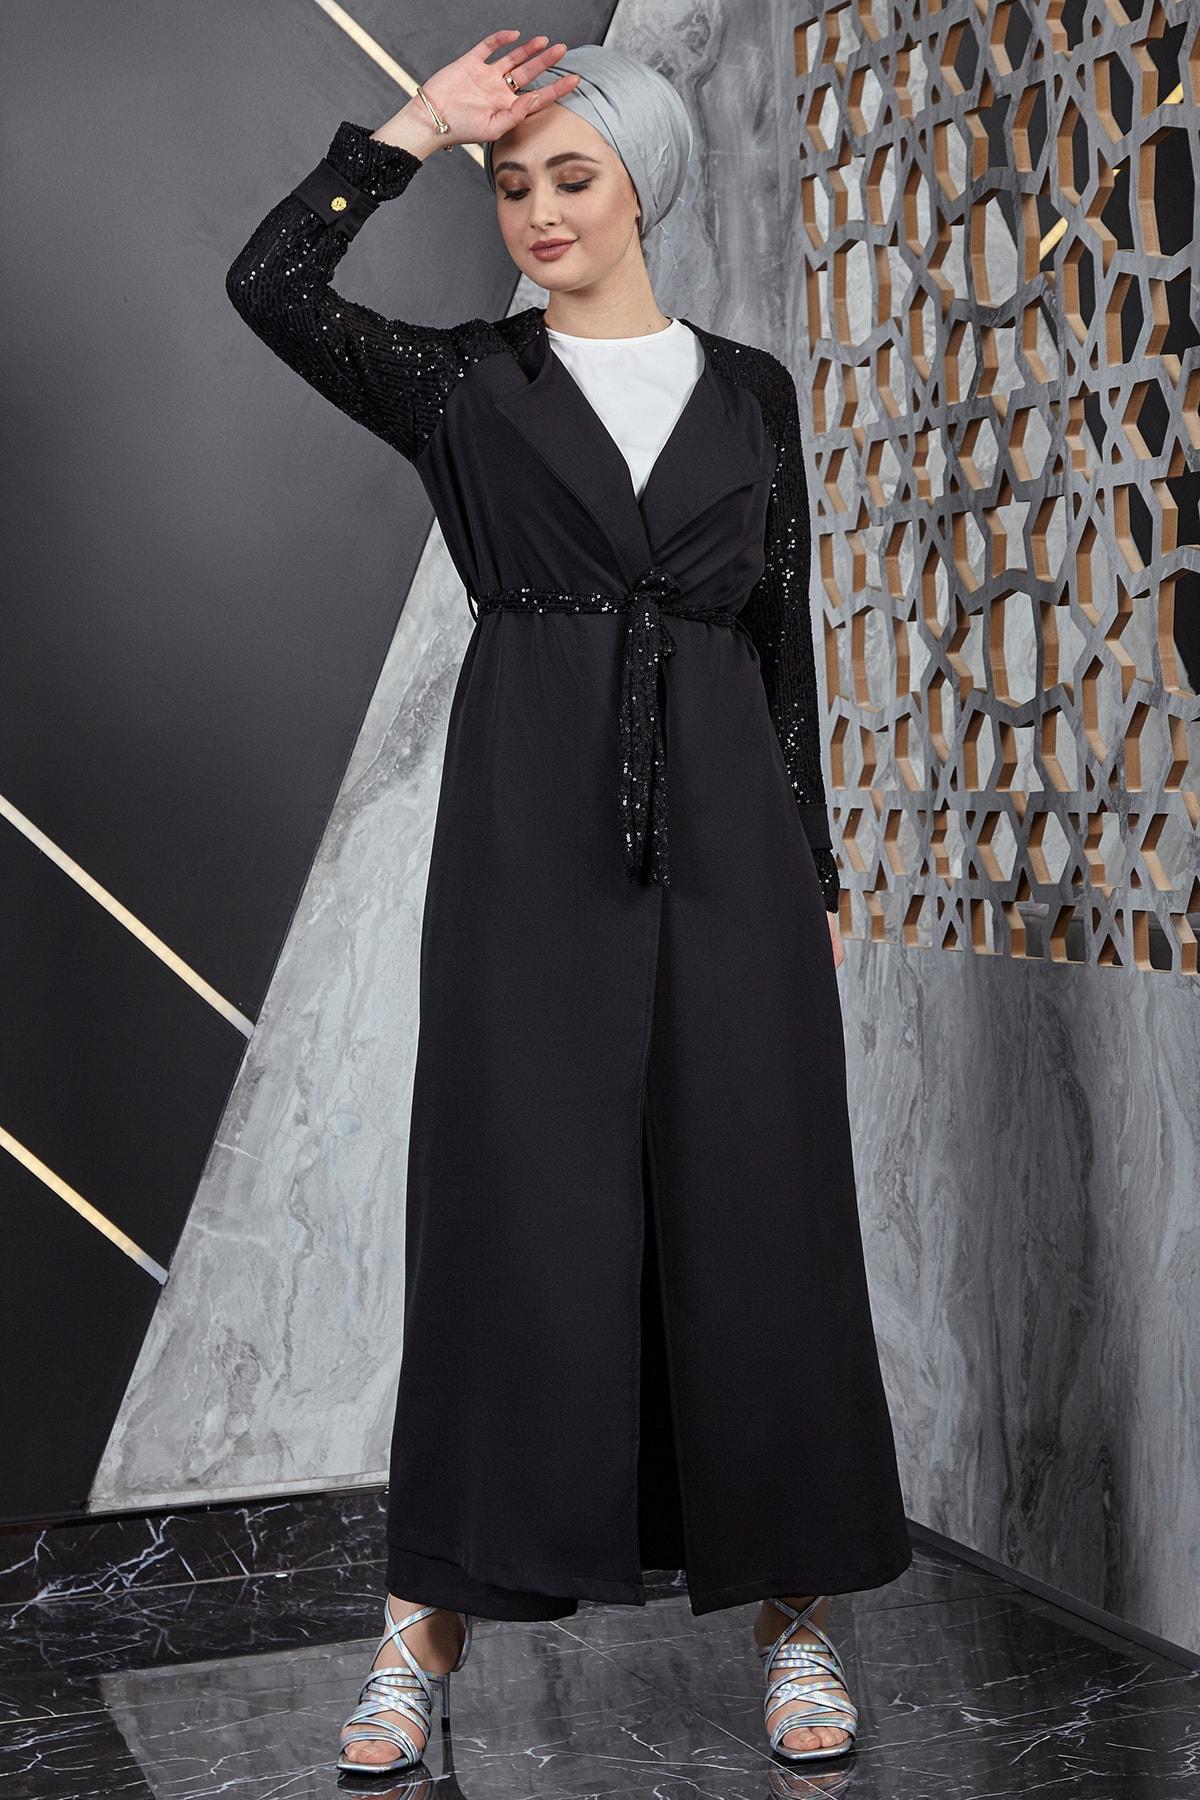 Kadın Pul Payetli Siyah Üçlü Takım 2143-01